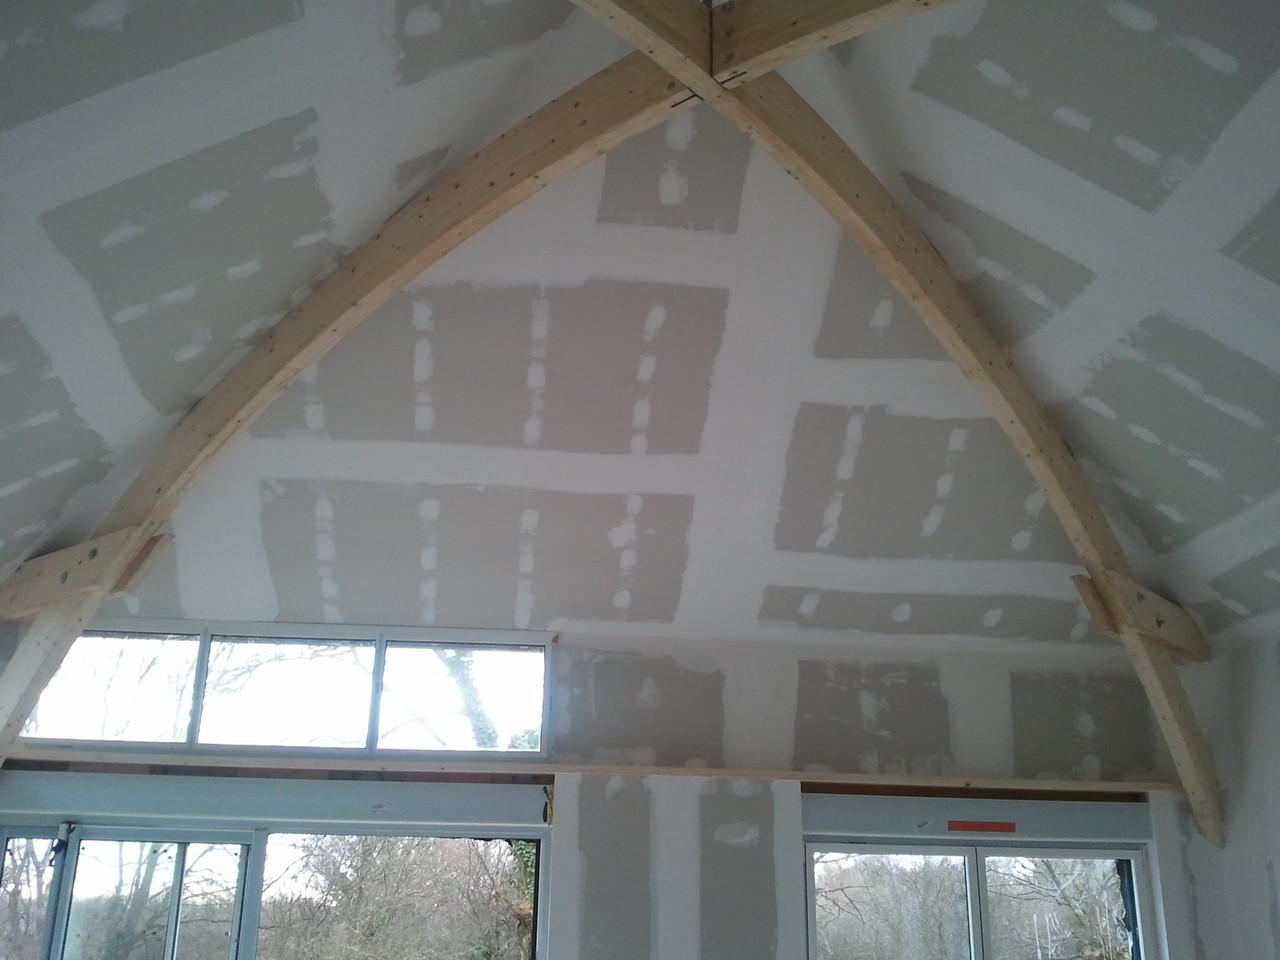 plafond effet arrondi BA13 entre panne